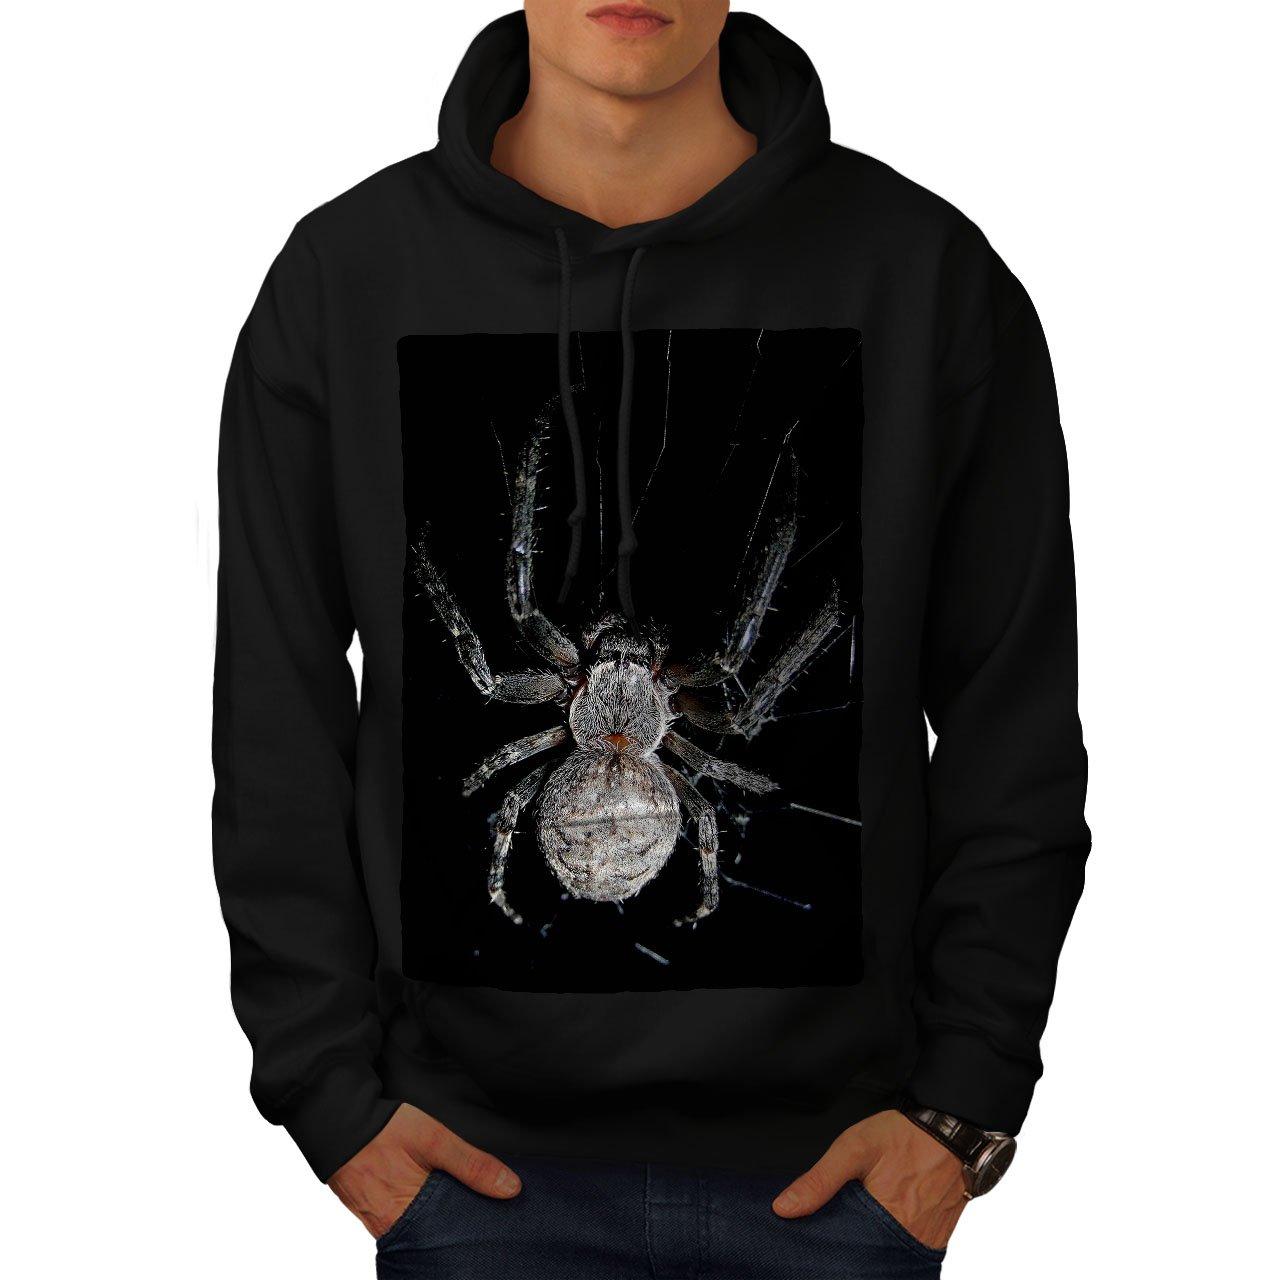 wellcoda Spider Web Photo Animal Mens Hoodie Web Hooded Sweatshirt